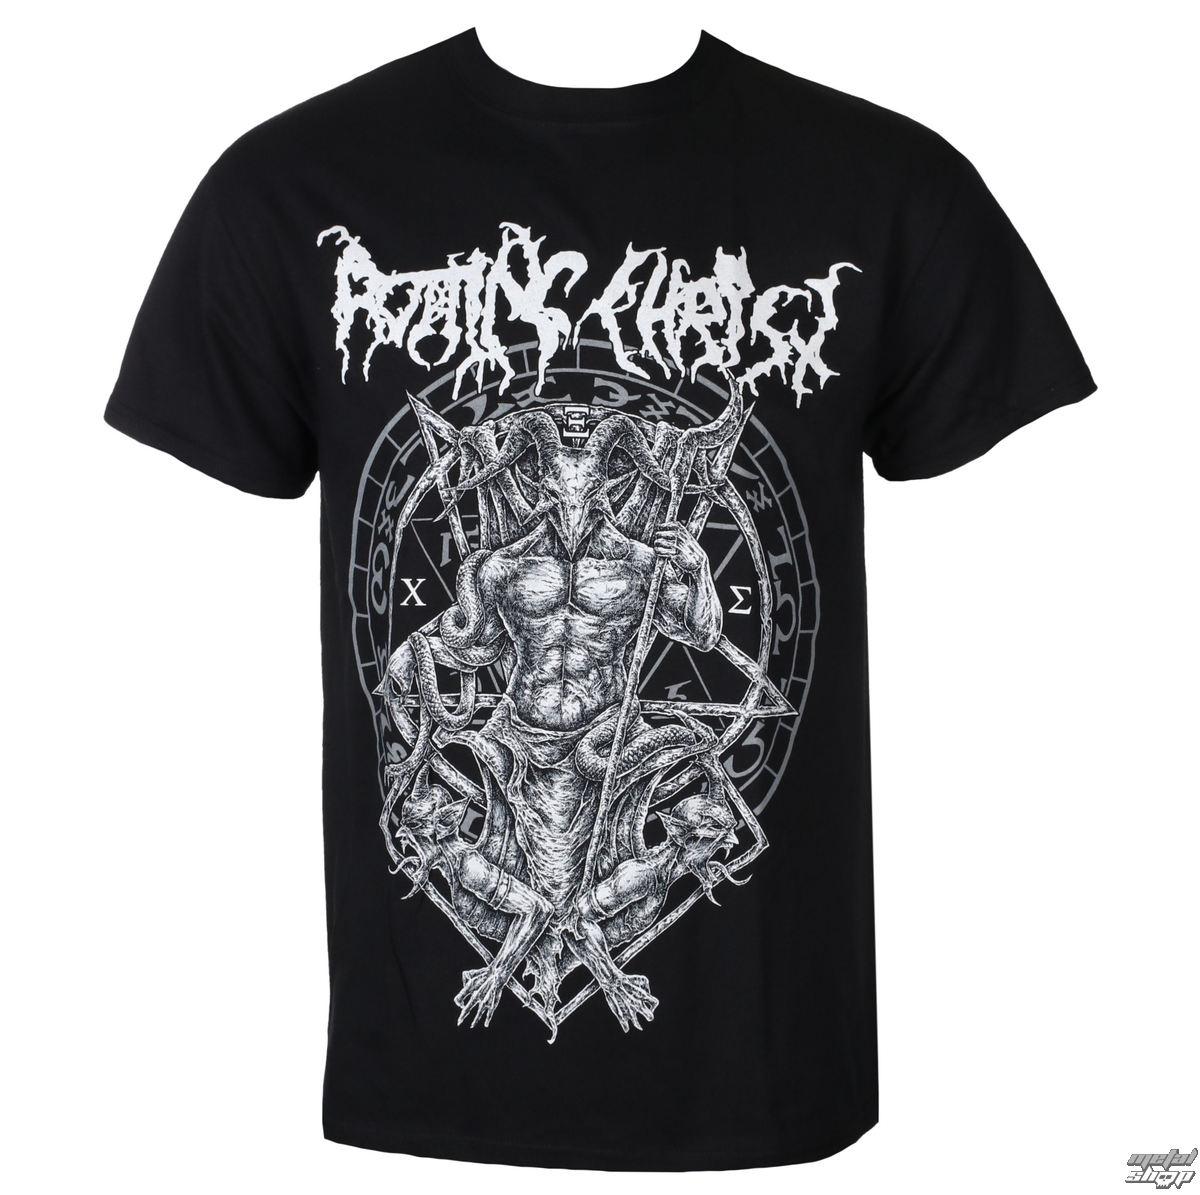 Hellenic Black Metal Legions T-shirt Shirts & Hemden Rotting Christ Fanartikel & Merchandise